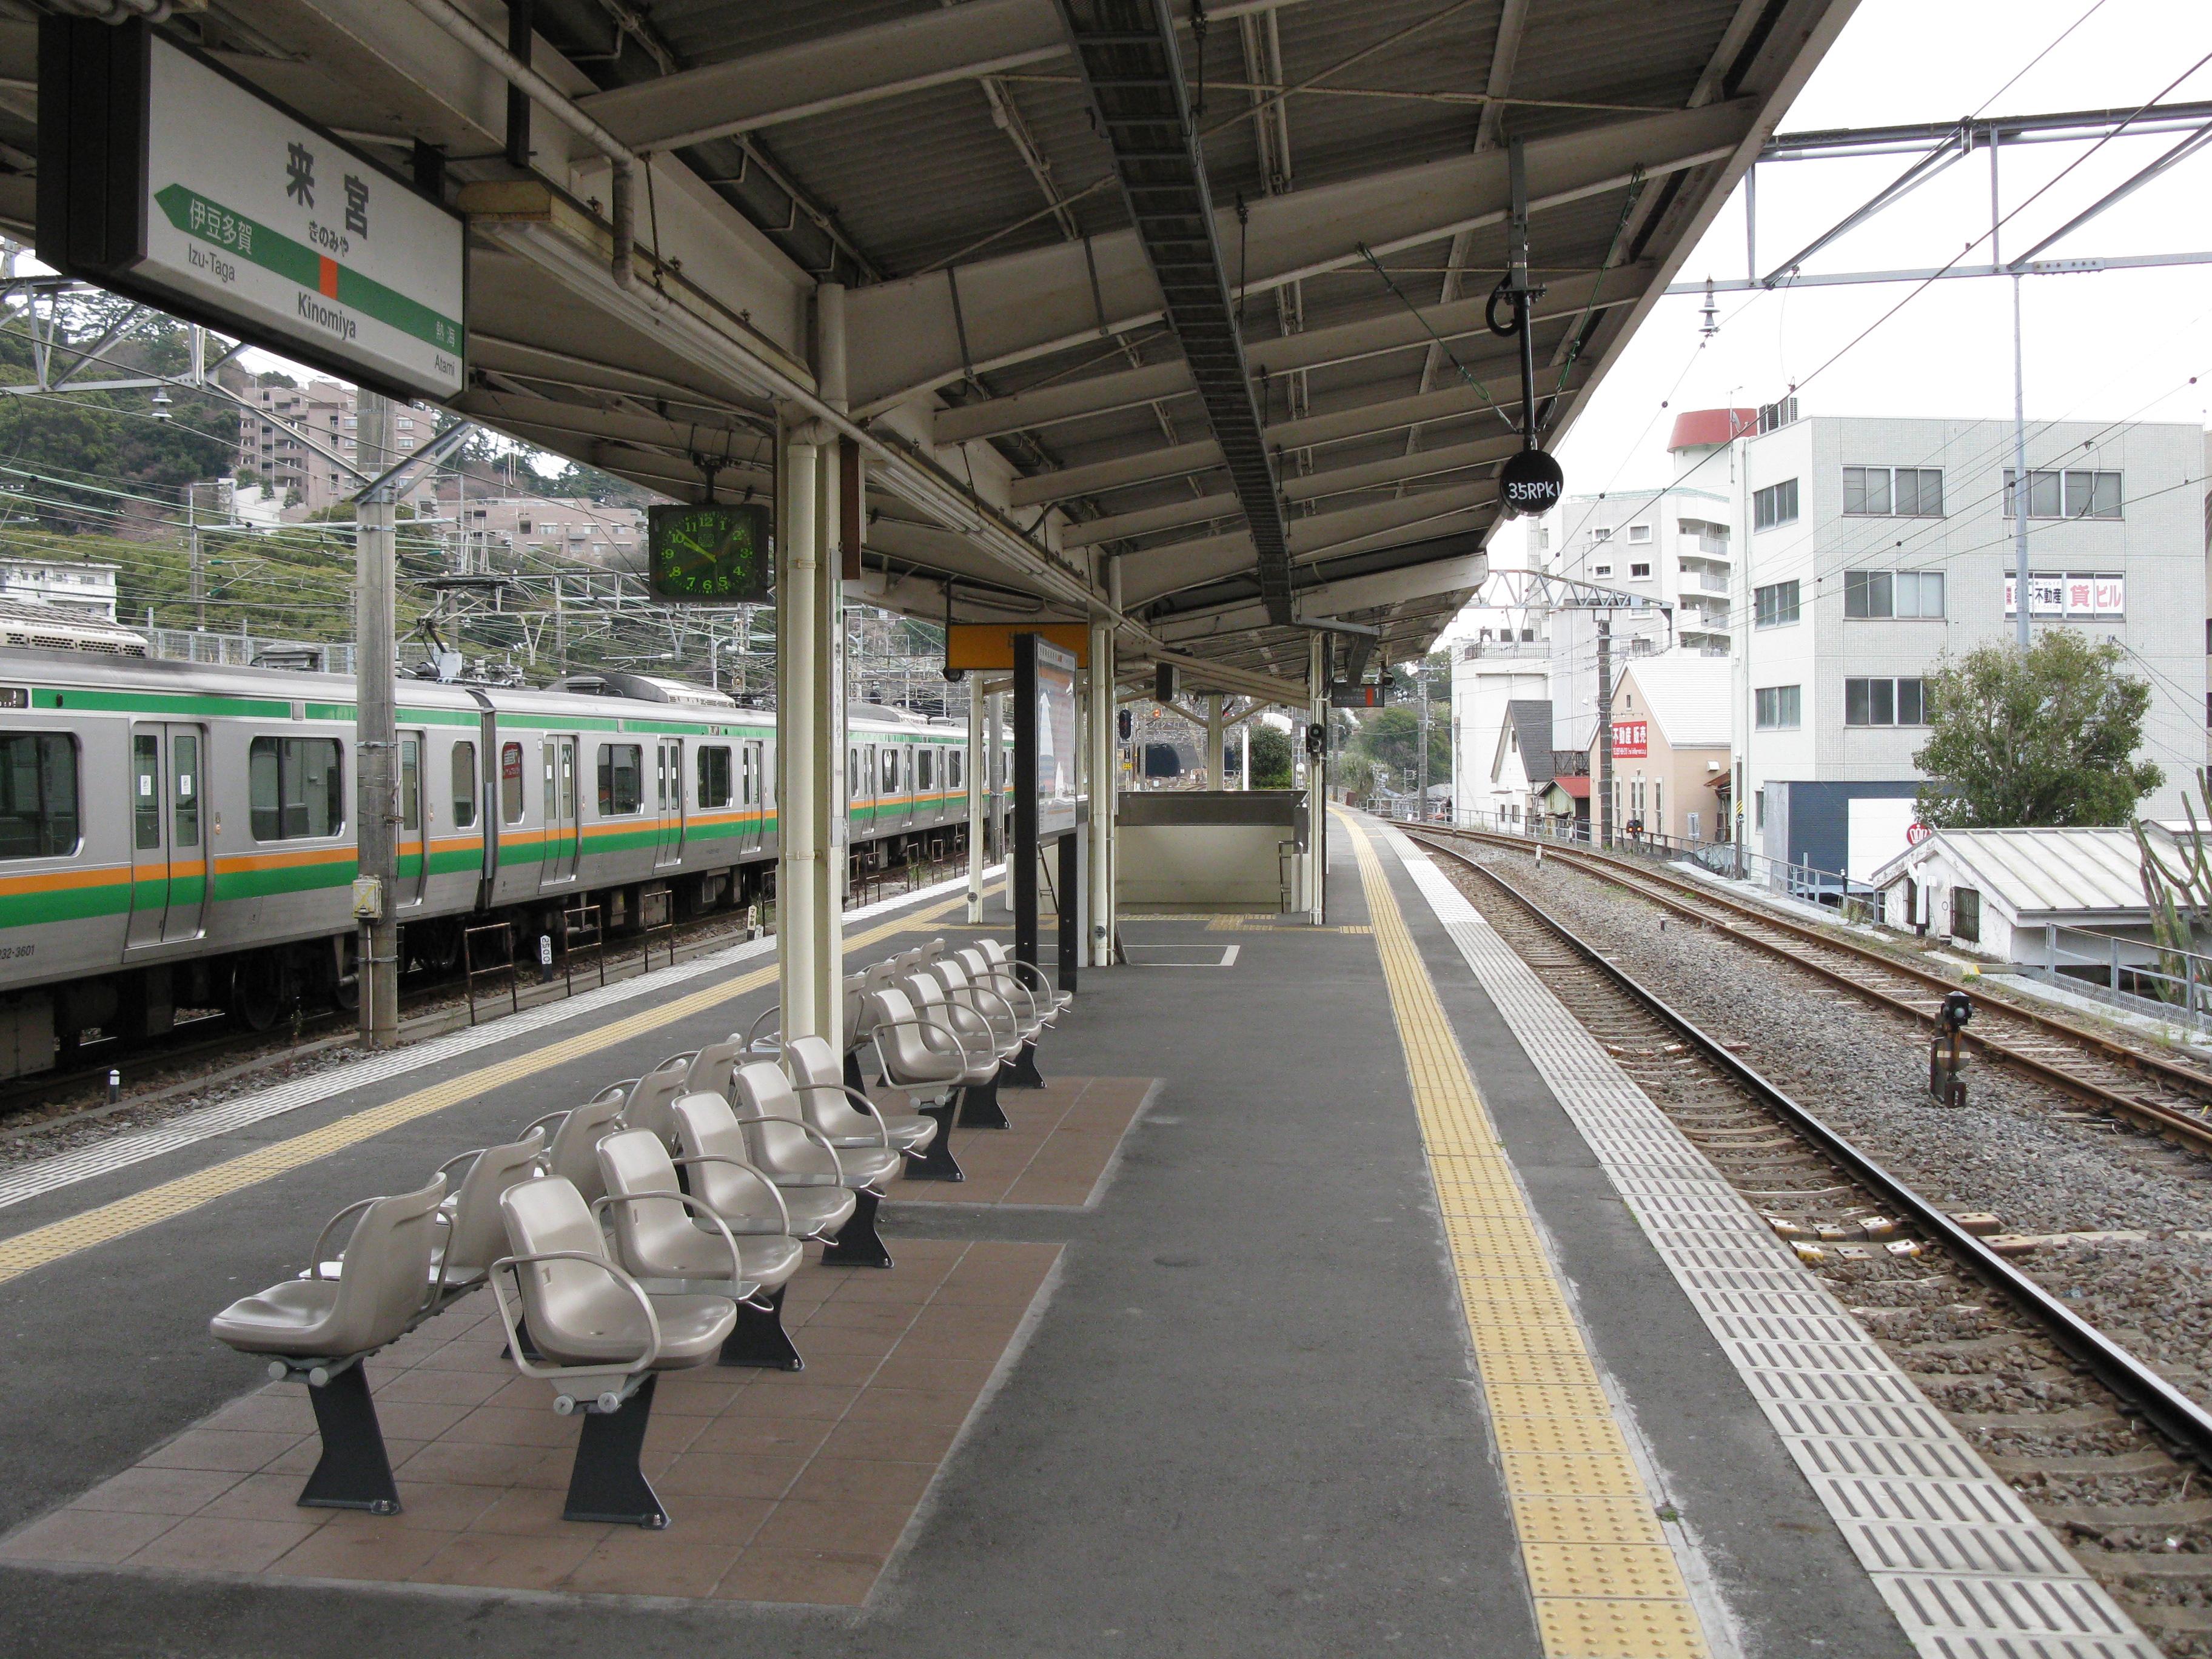 https://upload.wikimedia.org/wikipedia/commons/1/18/JREast-Ito-line-Kinomiya-station-platform-20100331.jpg